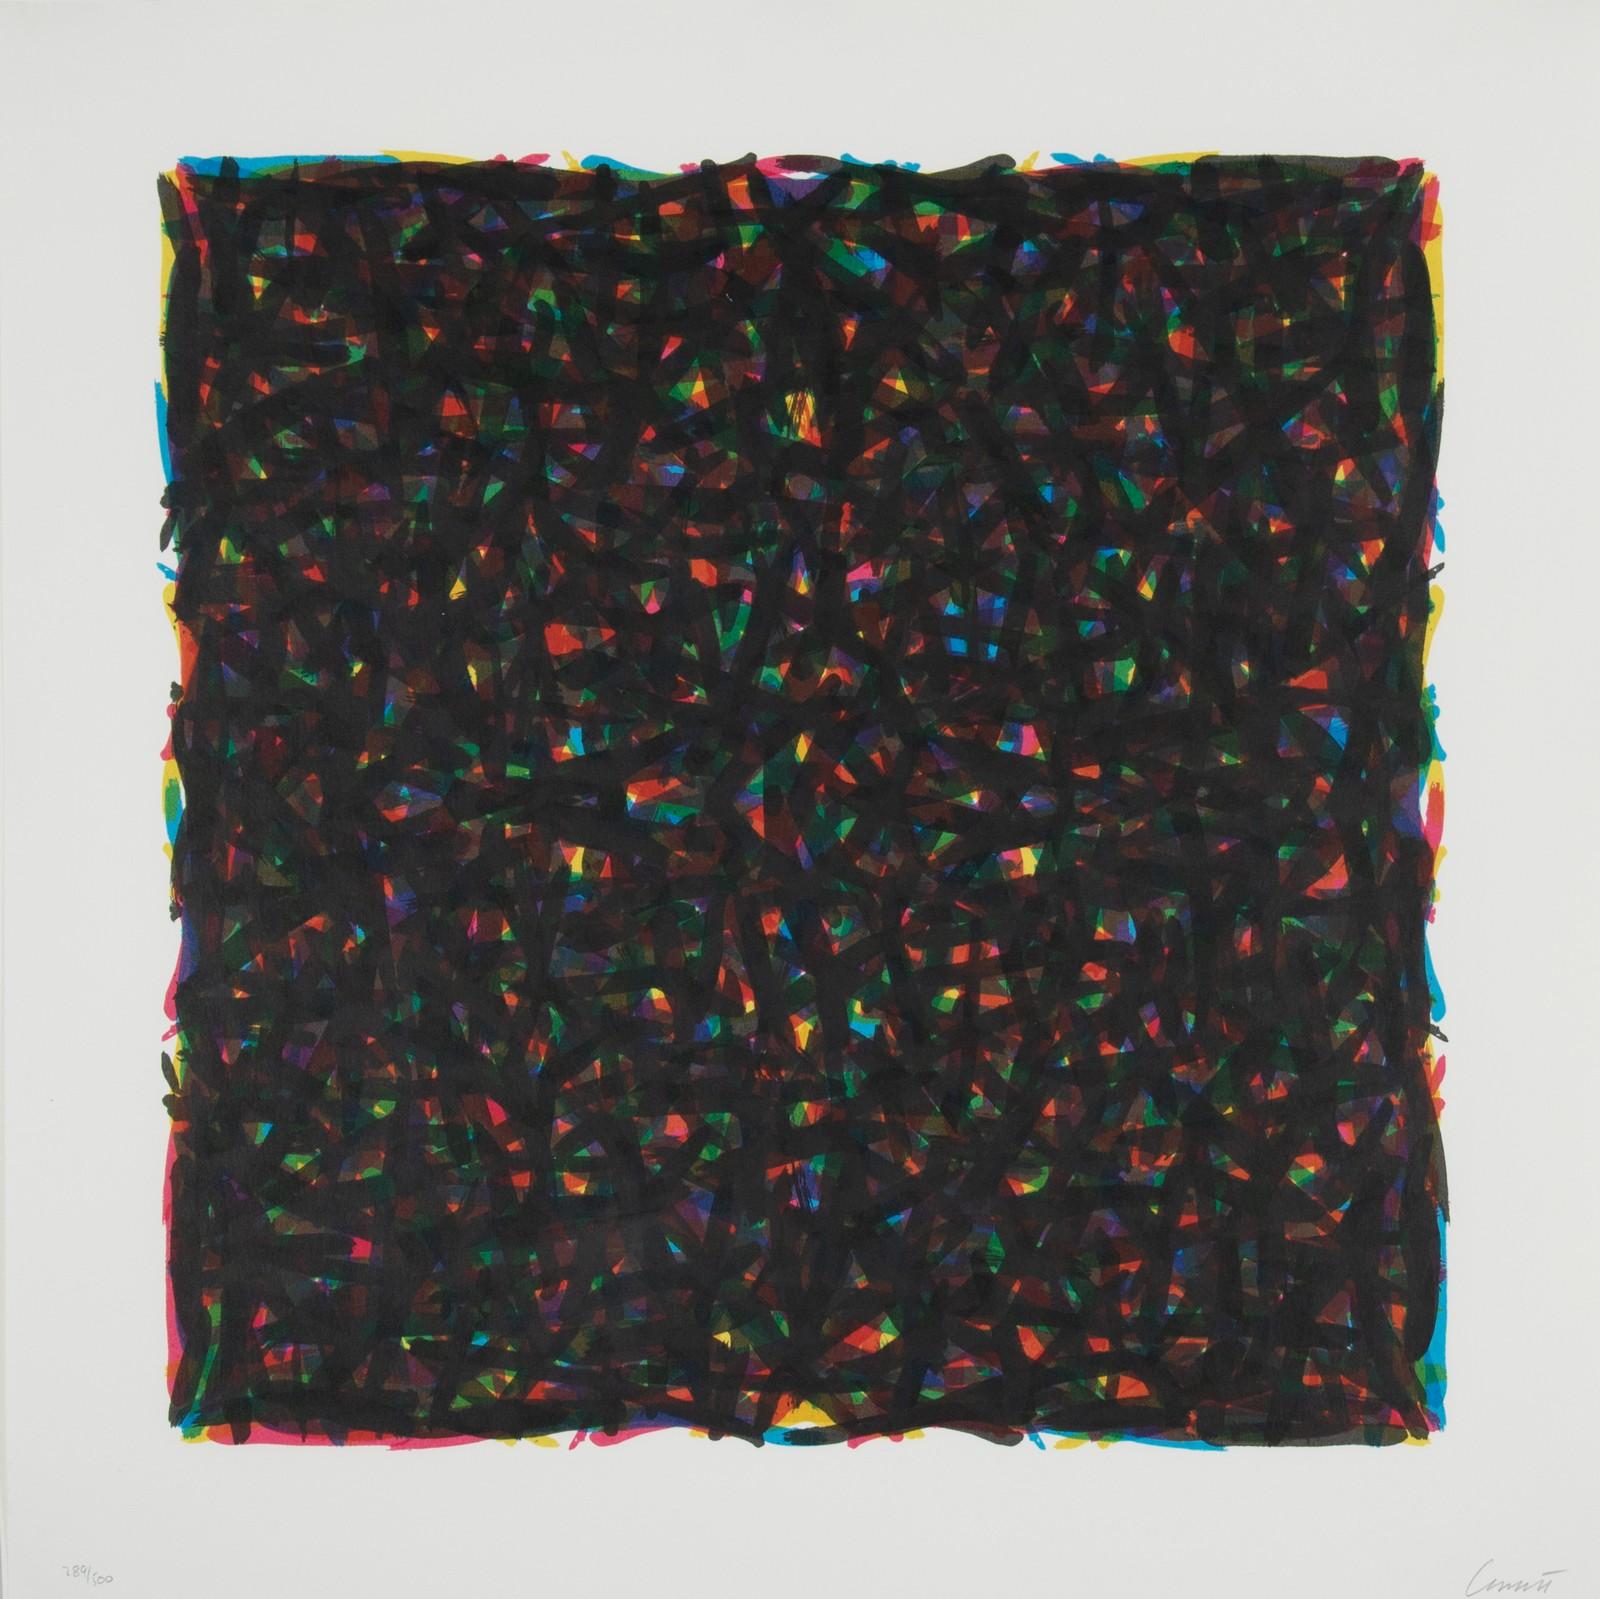 Watanabe, 1994, edition, 289/500, 40,5 x 40,5 cm